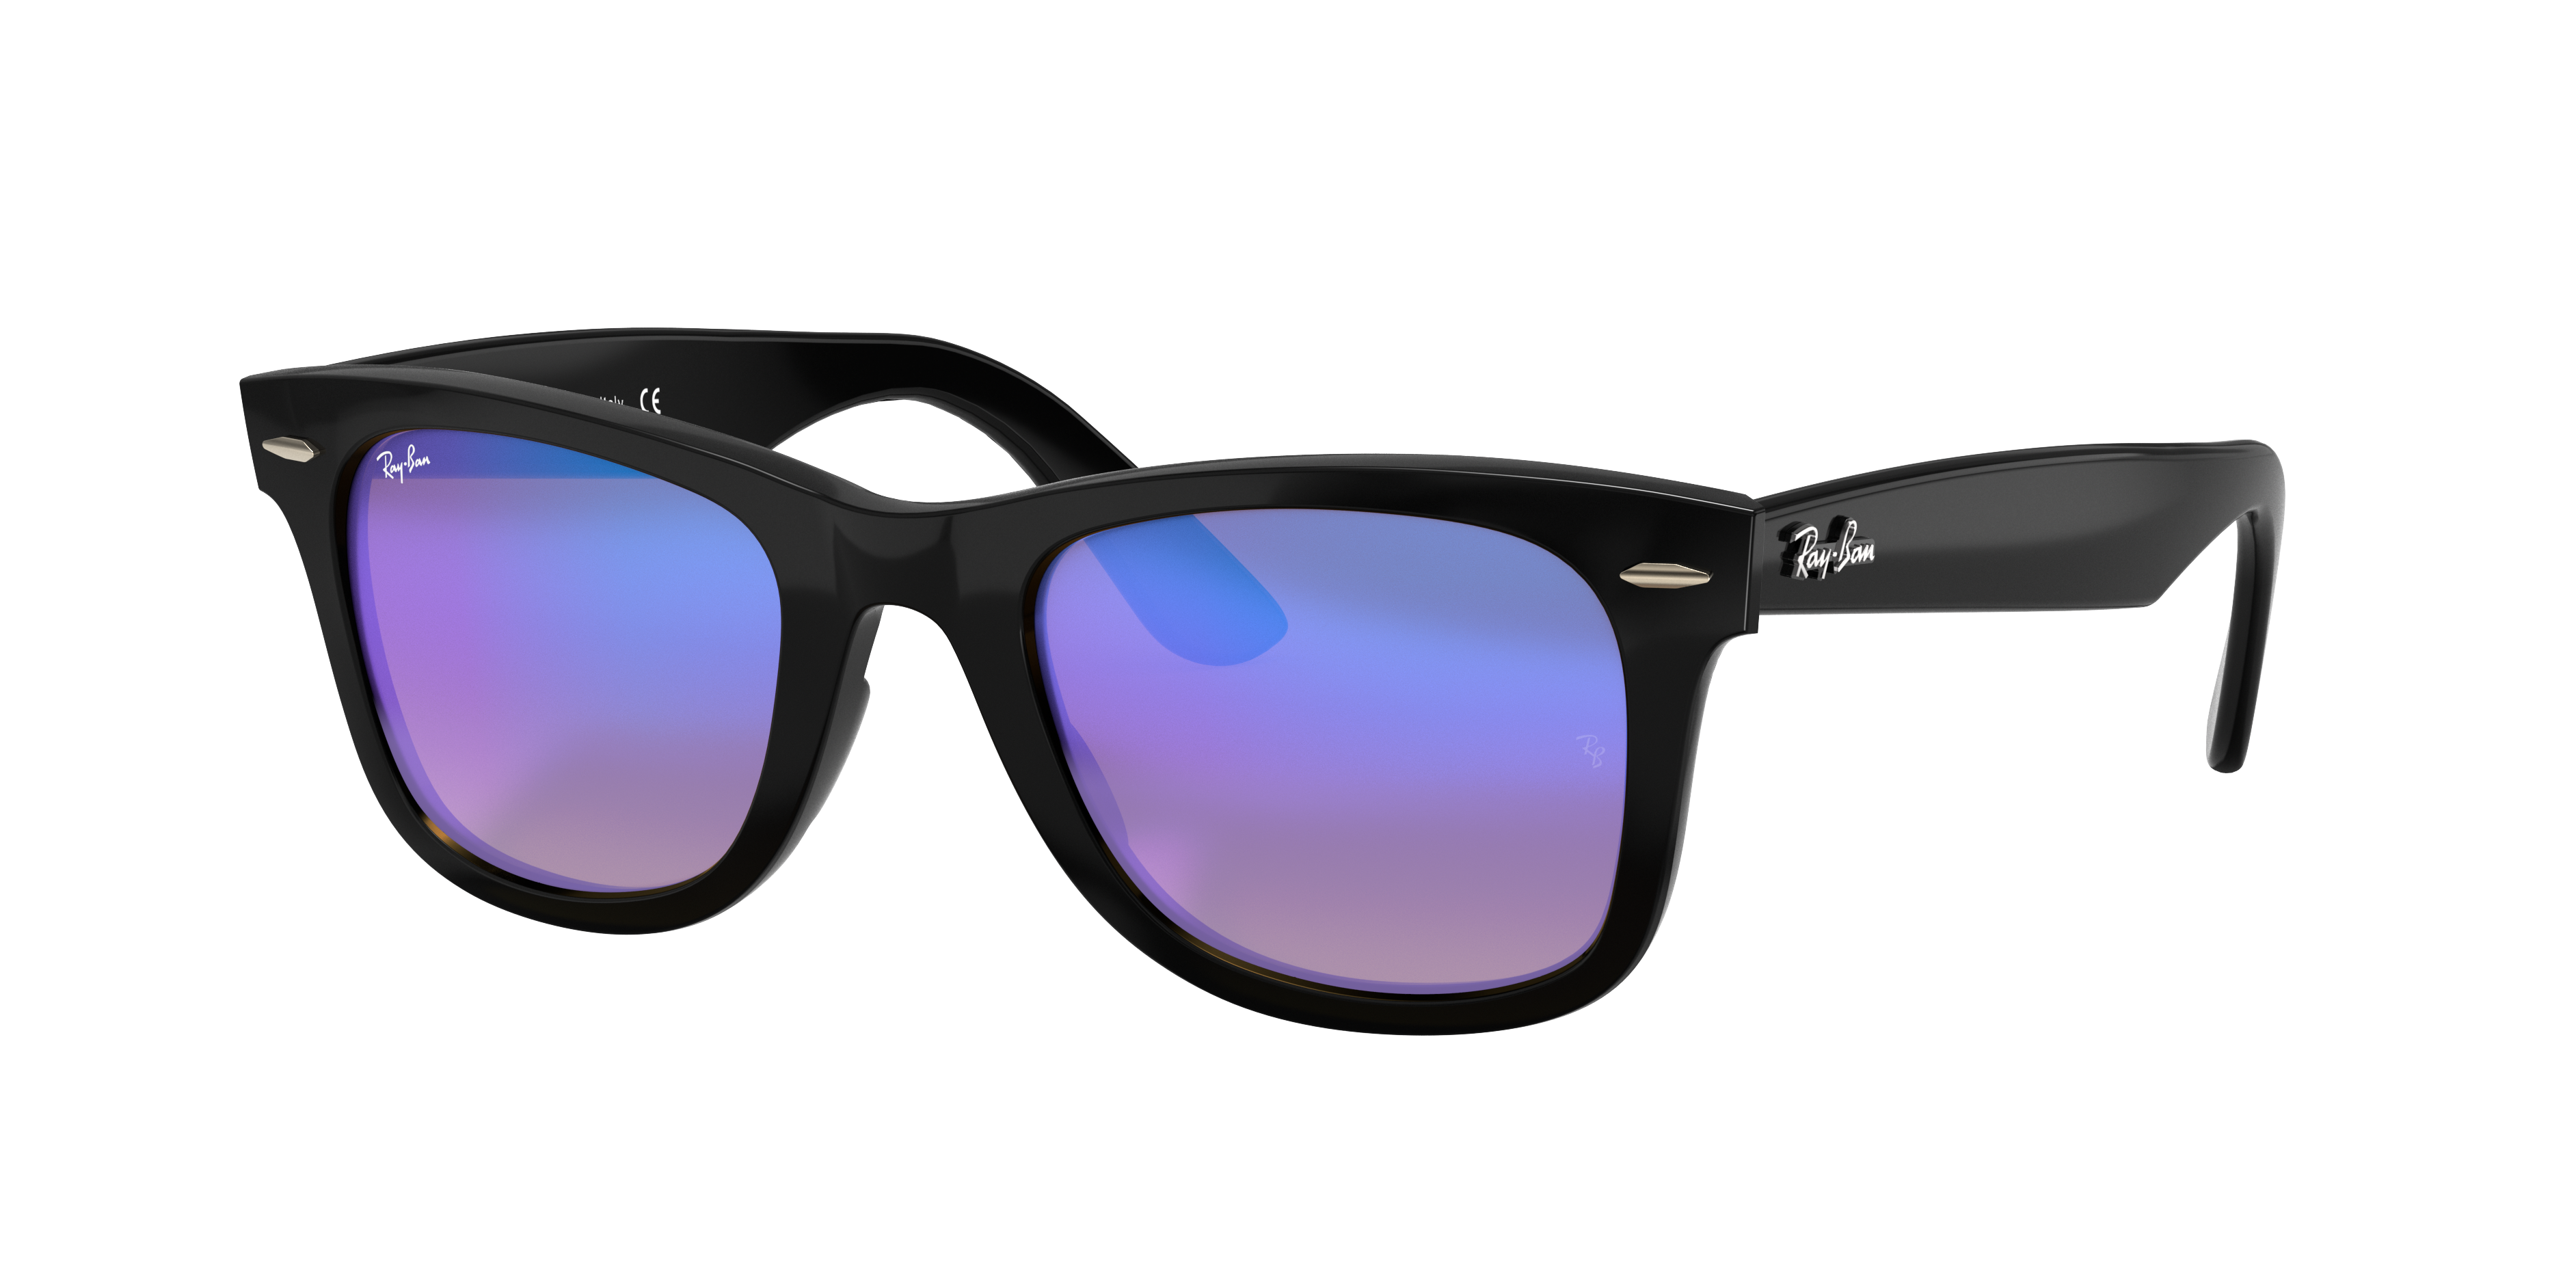 Ray-Ban Wayfarer Ease Black, Blue Lenses - RB4340